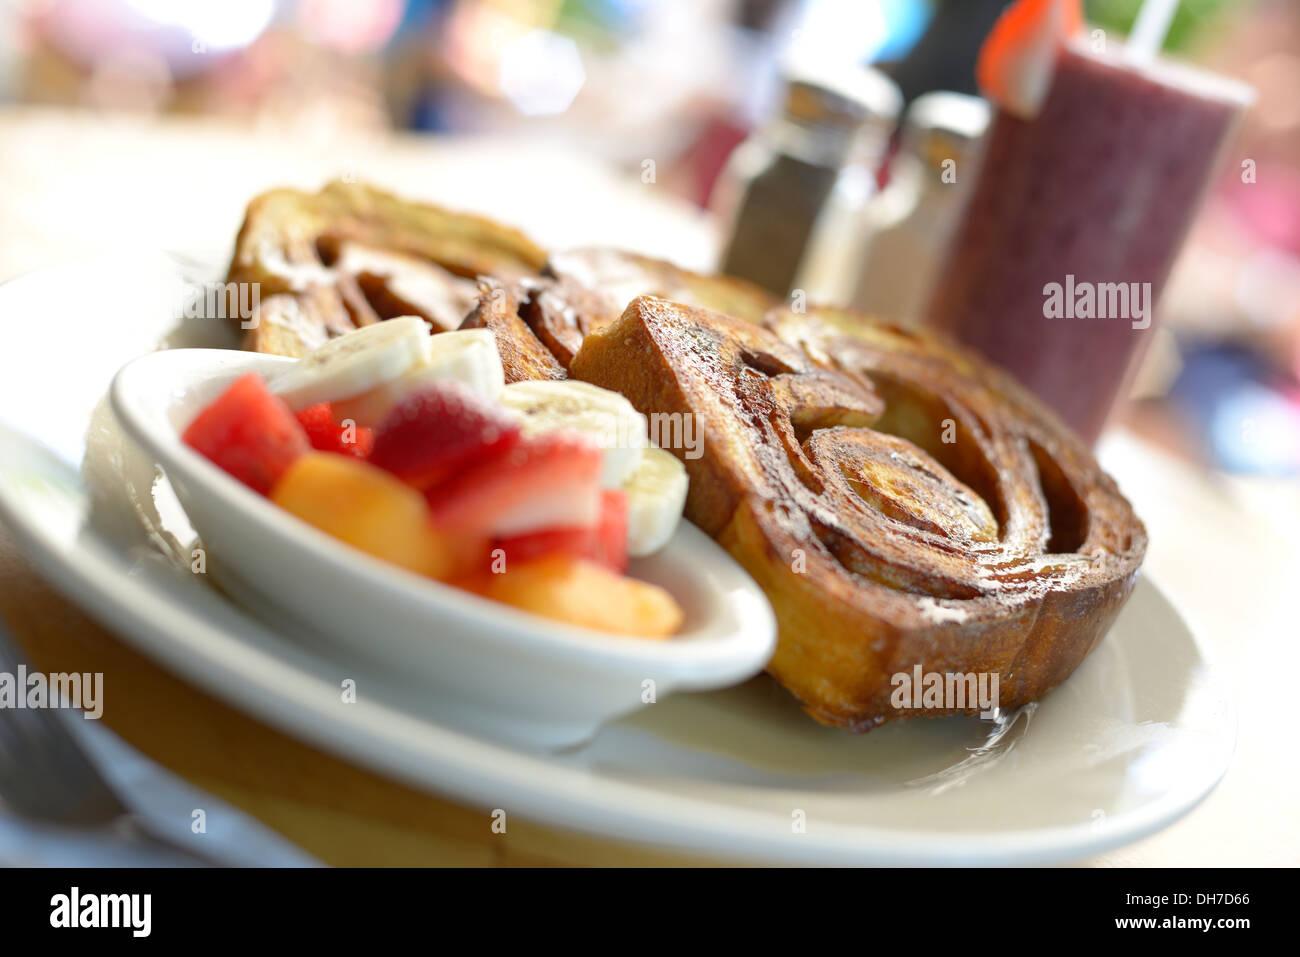 Babette s is a restaurant in east hampton ny serving for Restaurants that serve brunch